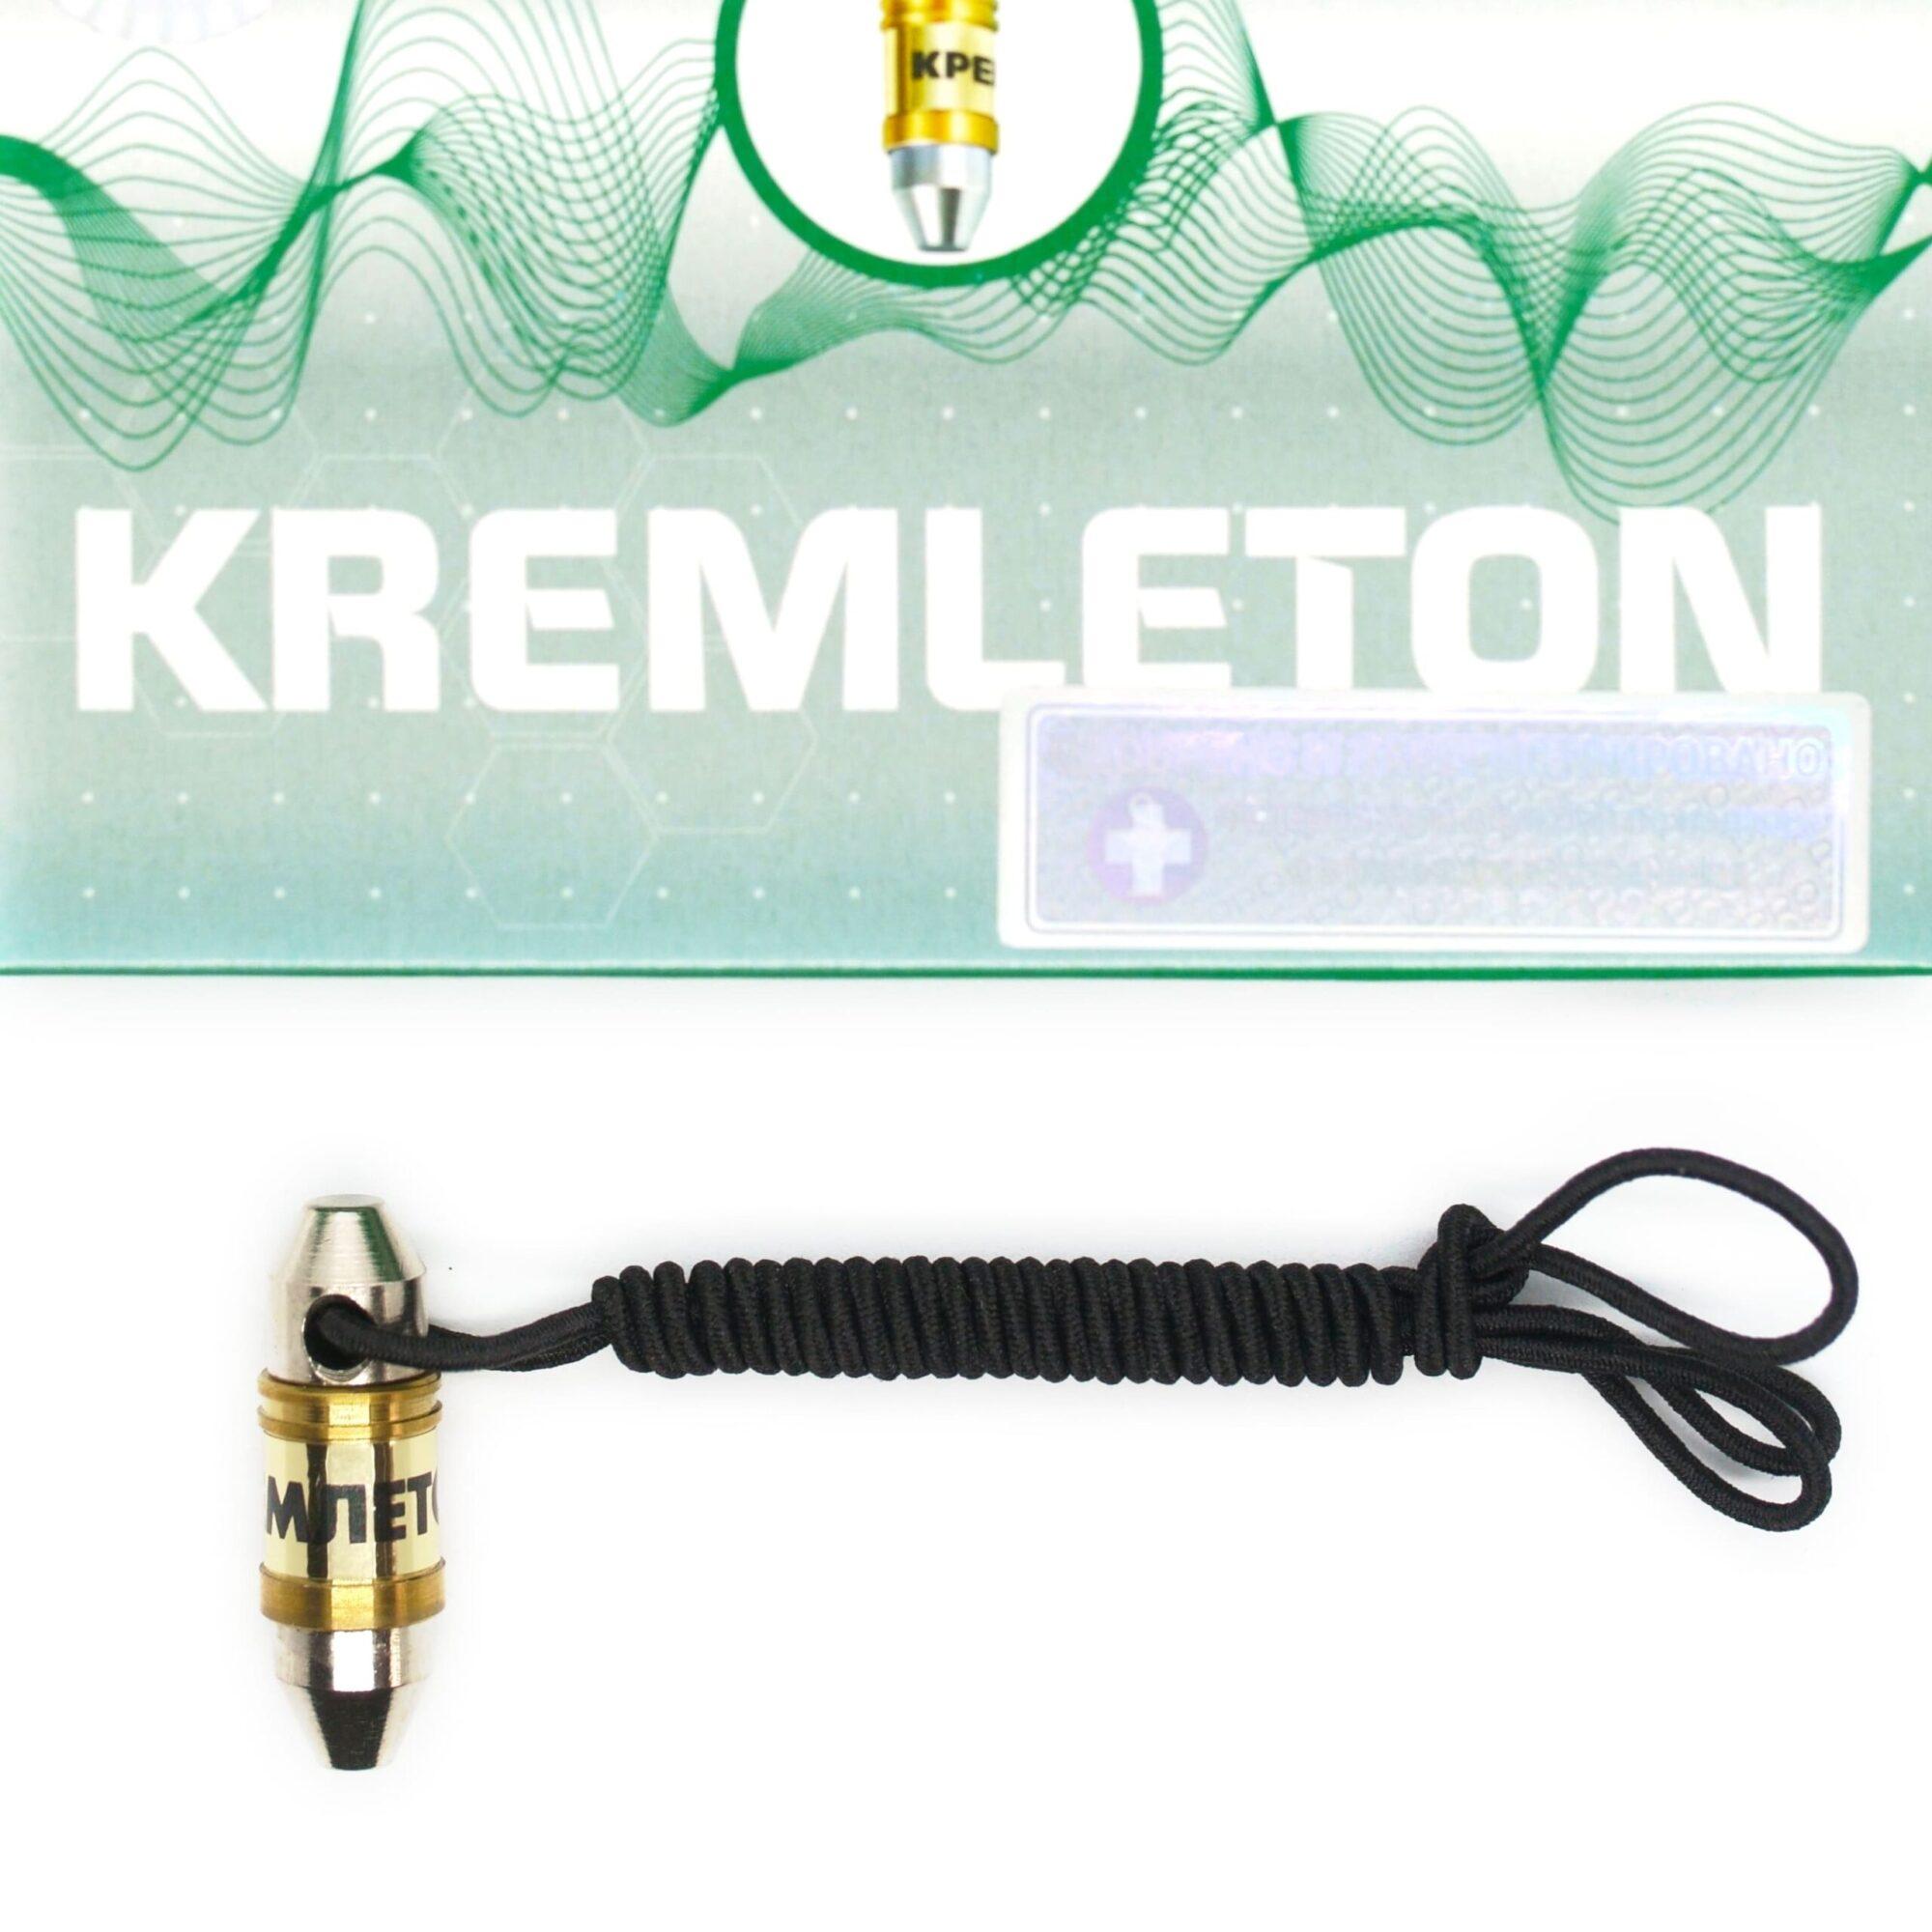 Кремлетон-6